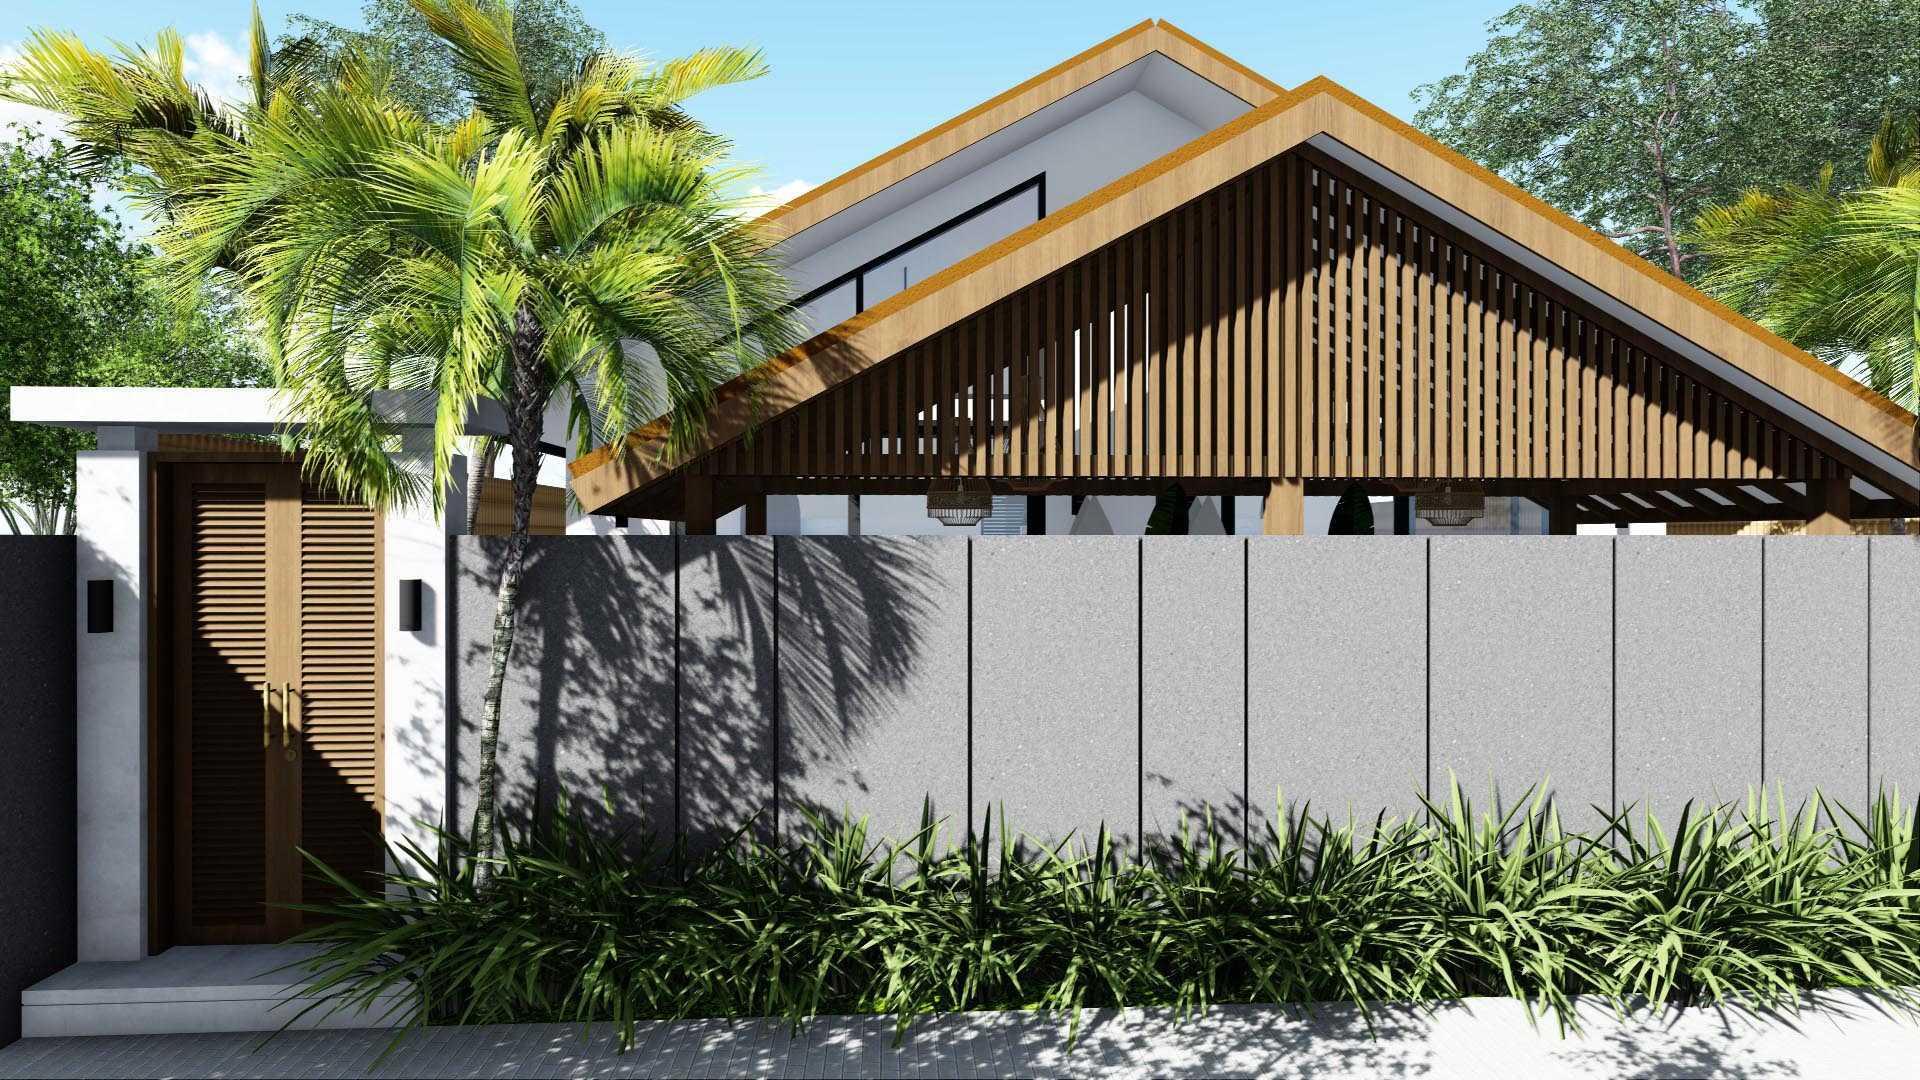 Revan Teggar Md Surf Studio Uluwatu Beach, Pecatu, South Kuta, Badung Regency, Bali 80361, Indonesia Uluwatu Beach, Pecatu, South Kuta, Badung Regency, Bali 80361, Indonesia Revan-Teggar-Md-Surf-Studio  129732